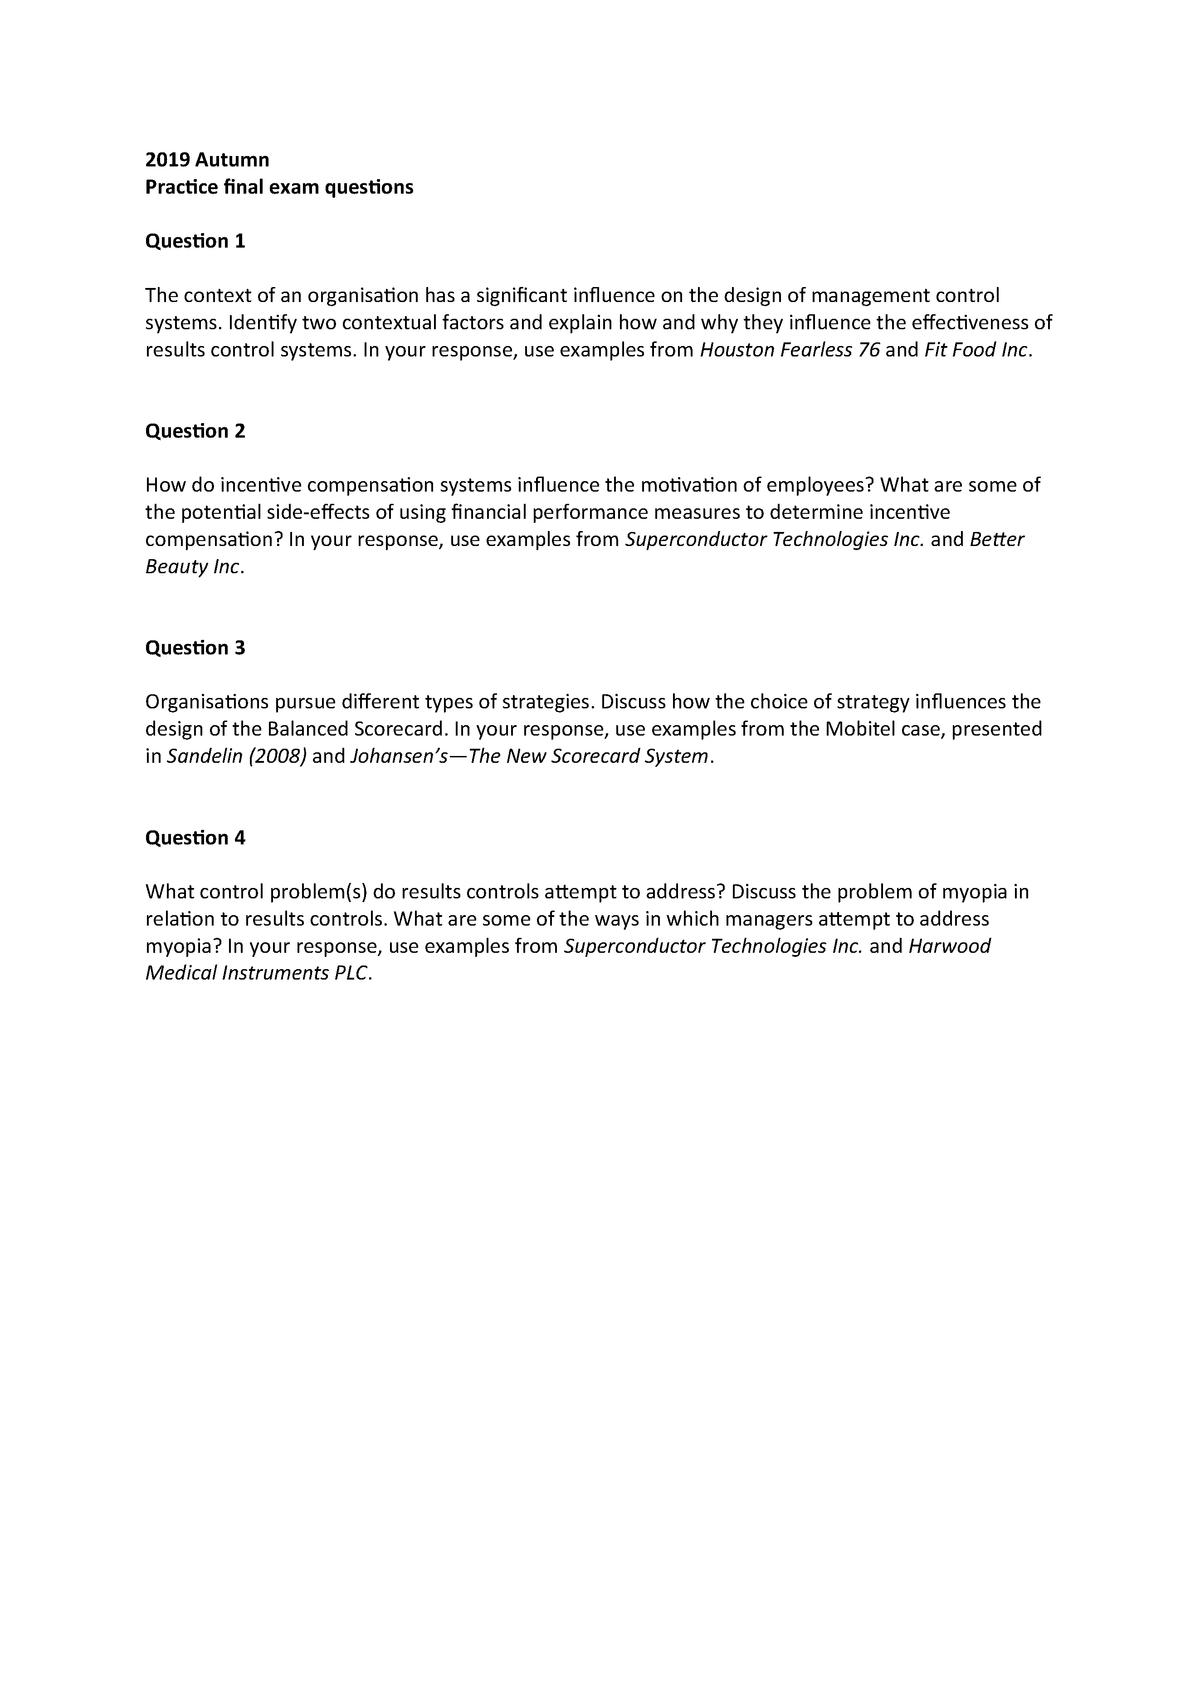 Practice Final Exam Questions (2019 Autumn) - 022705 : Management